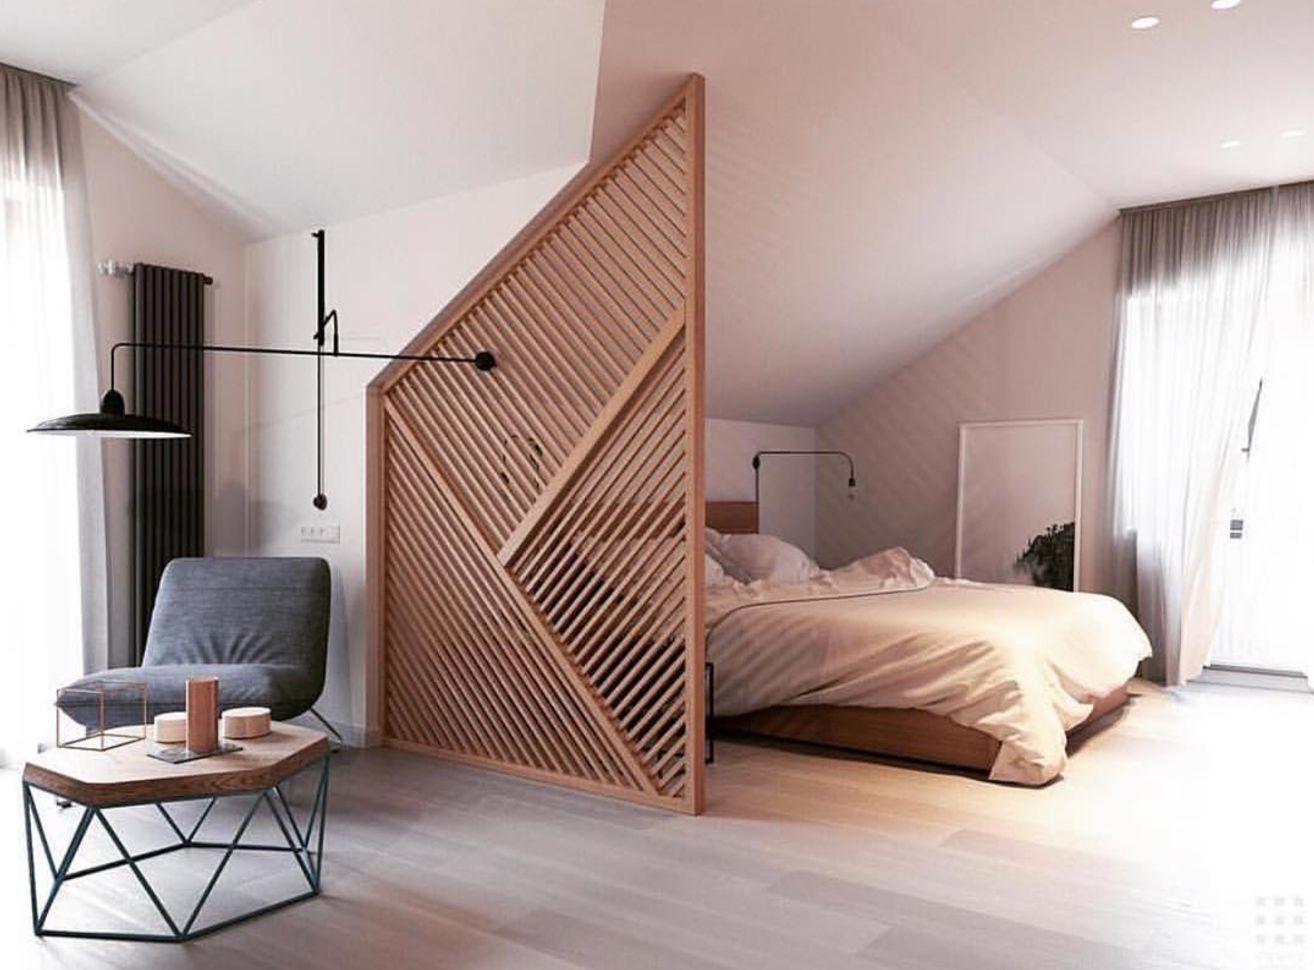 Room divider home decoración pinterest divider studio